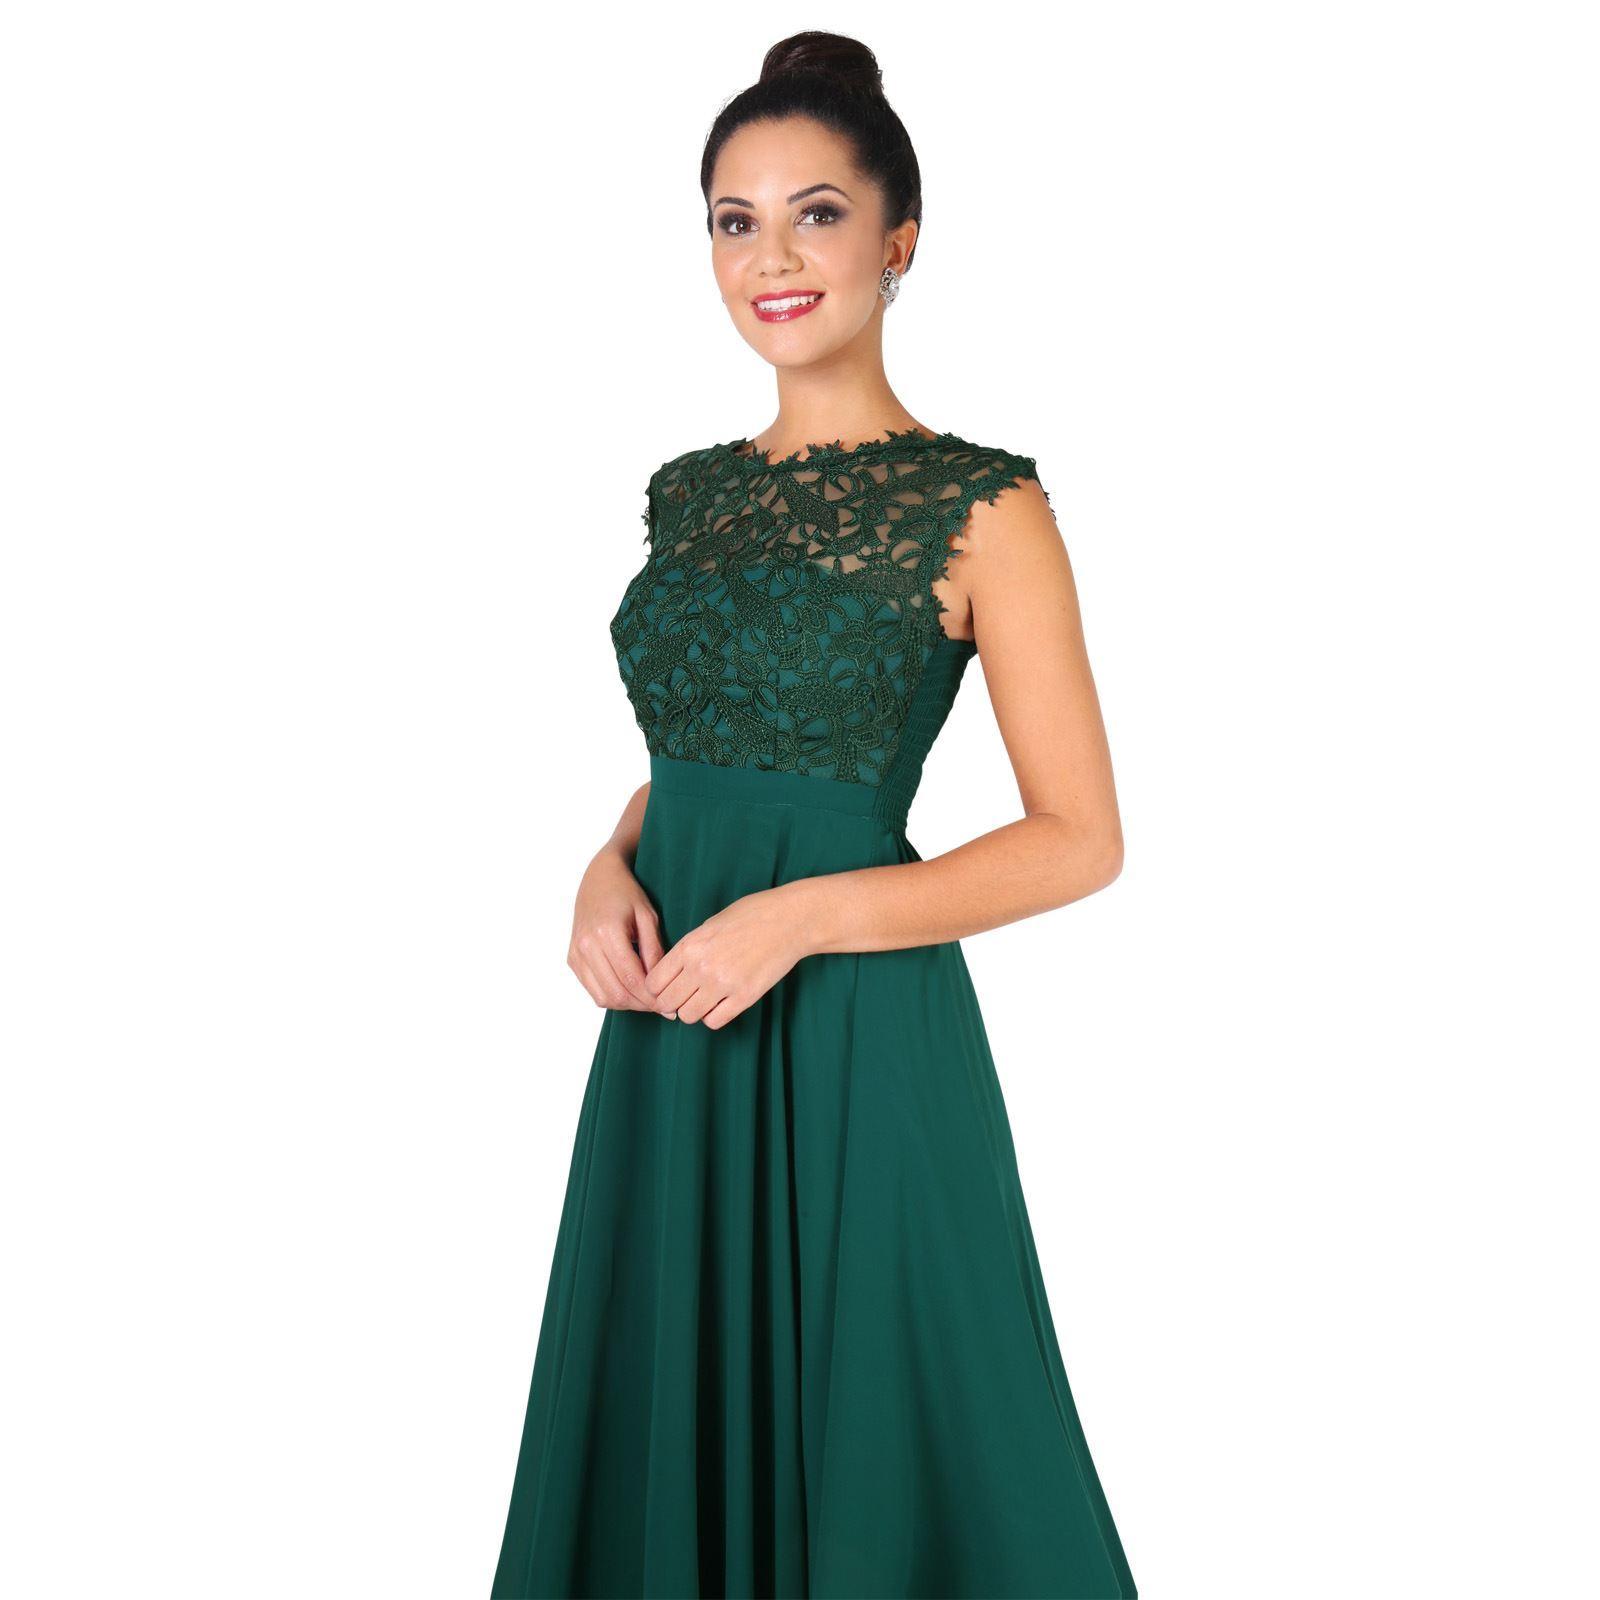 Womens-Wedding-Bridesmaid-Prom-Dress-Formal-One-Off-Shoulder-Long-Evening-8-18 thumbnail 18